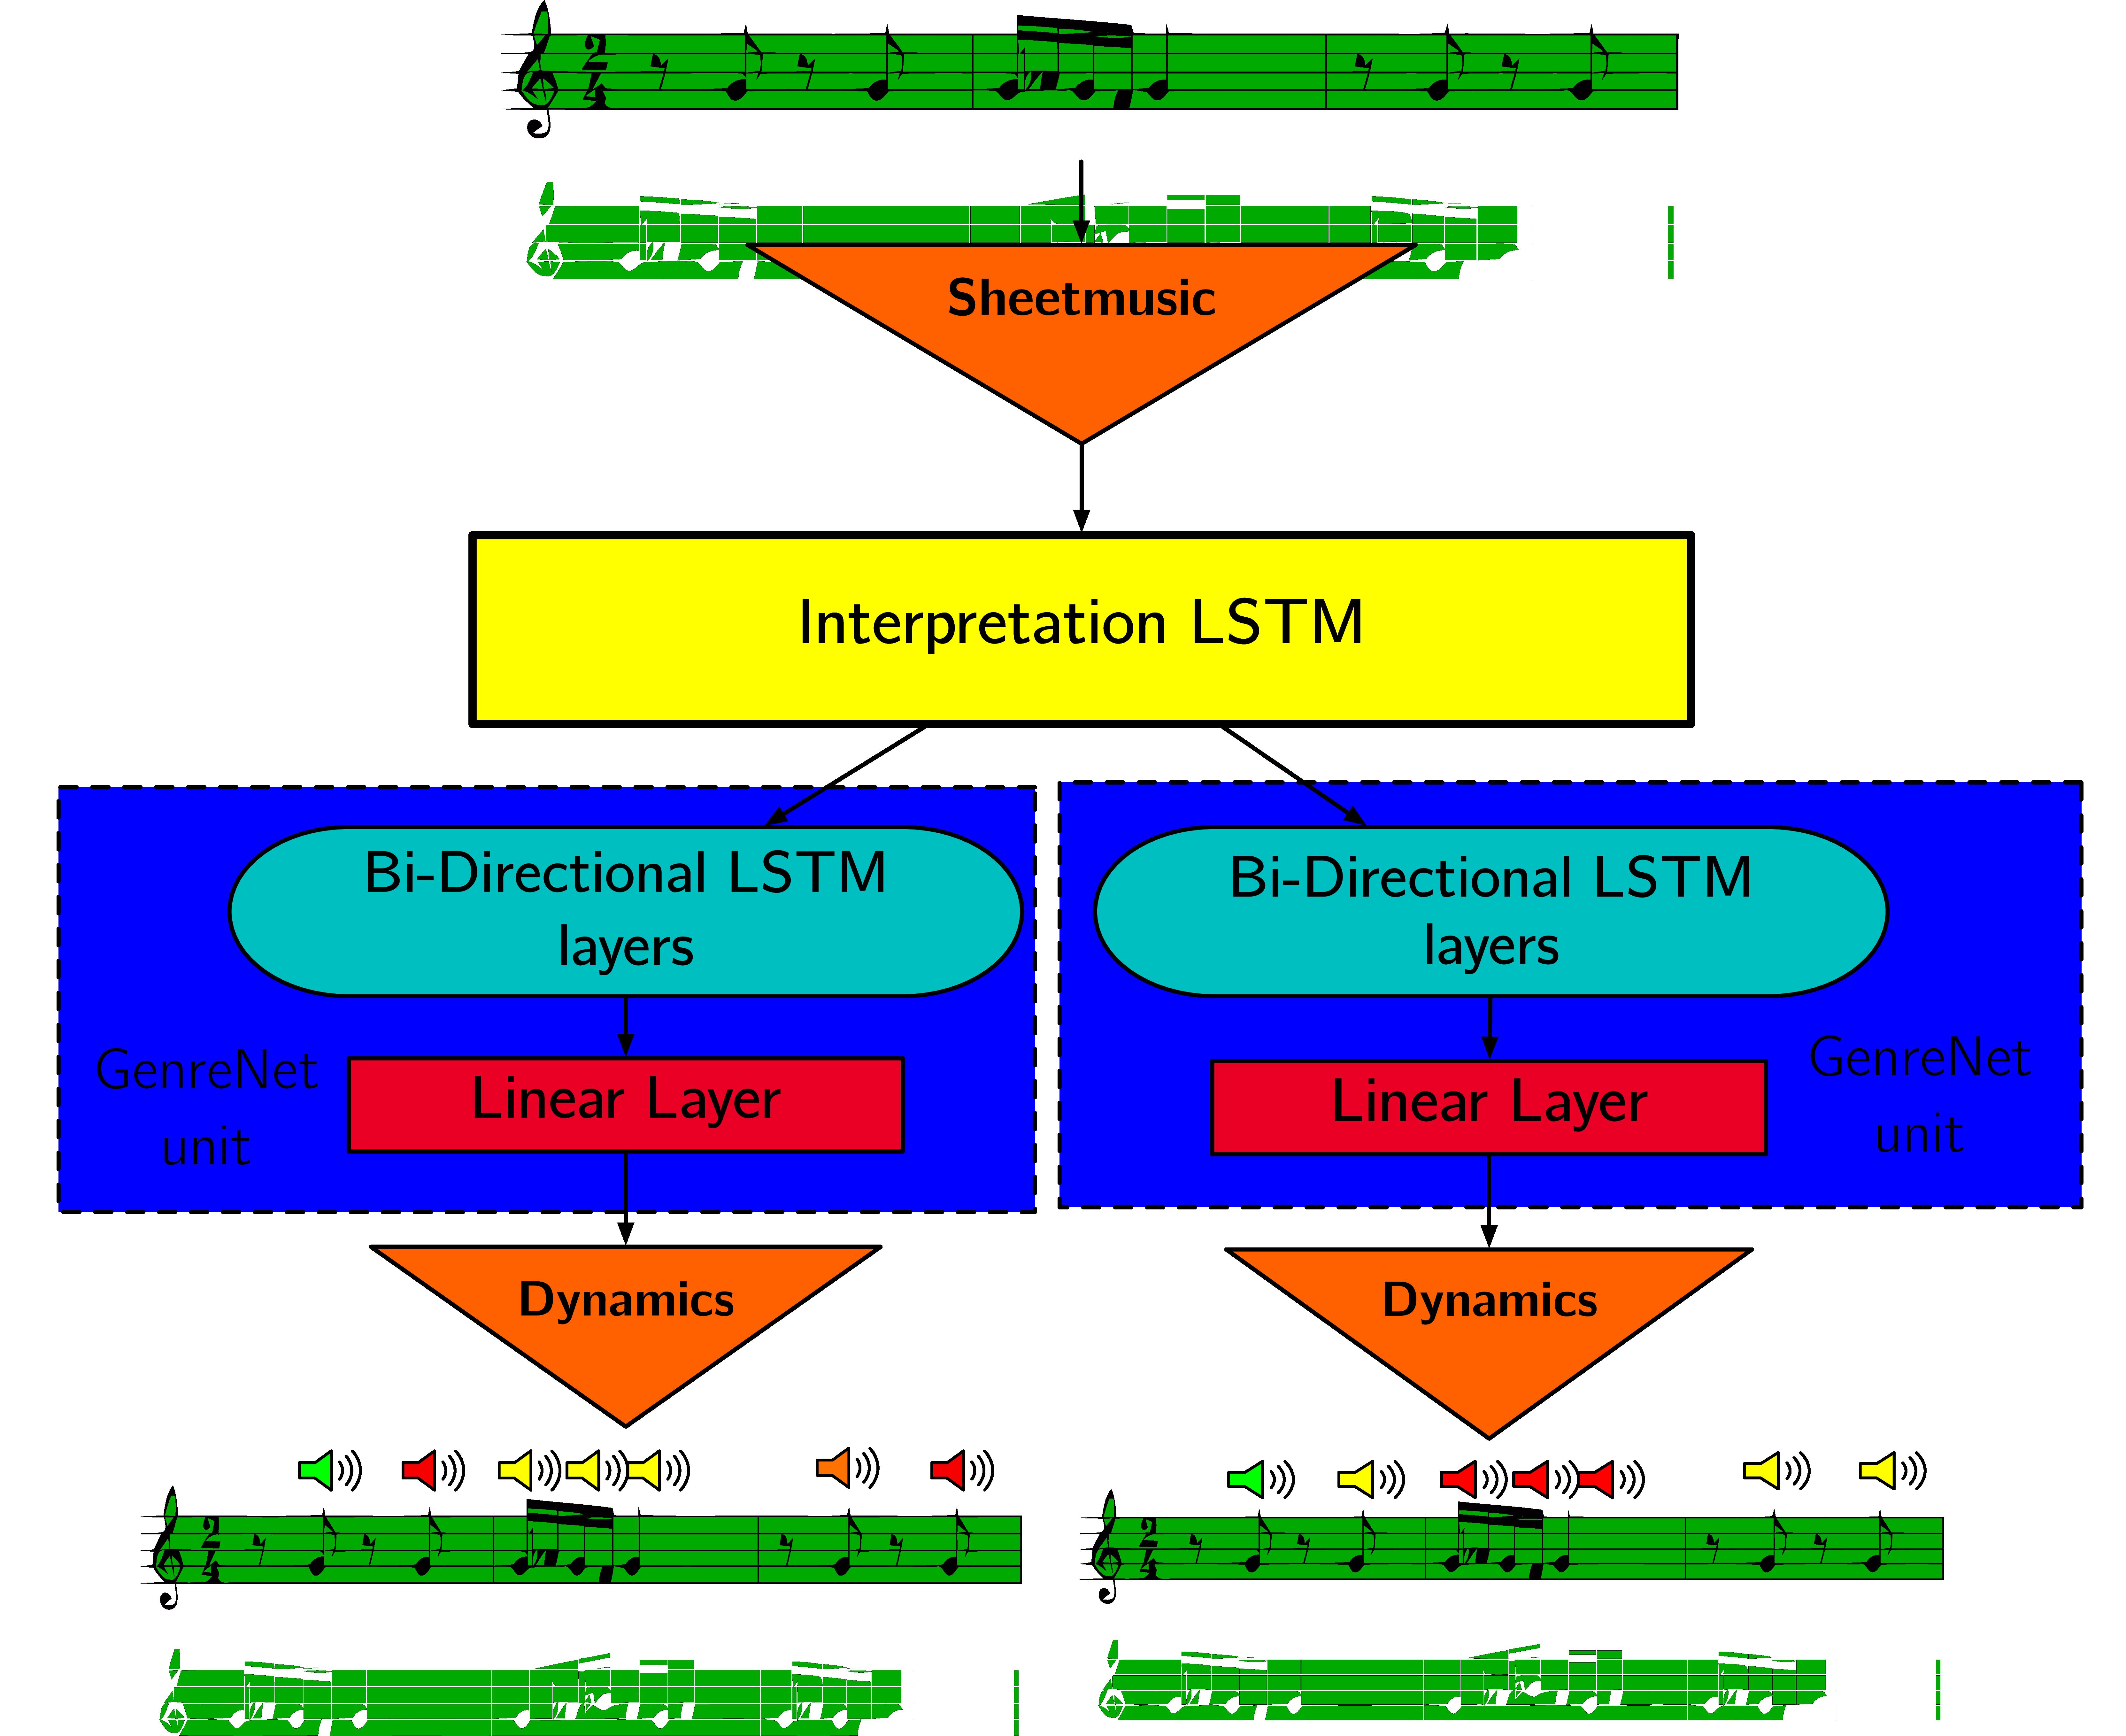 GitHub - imalikshake/StyleNet: A cute multi-layer LSTM that can